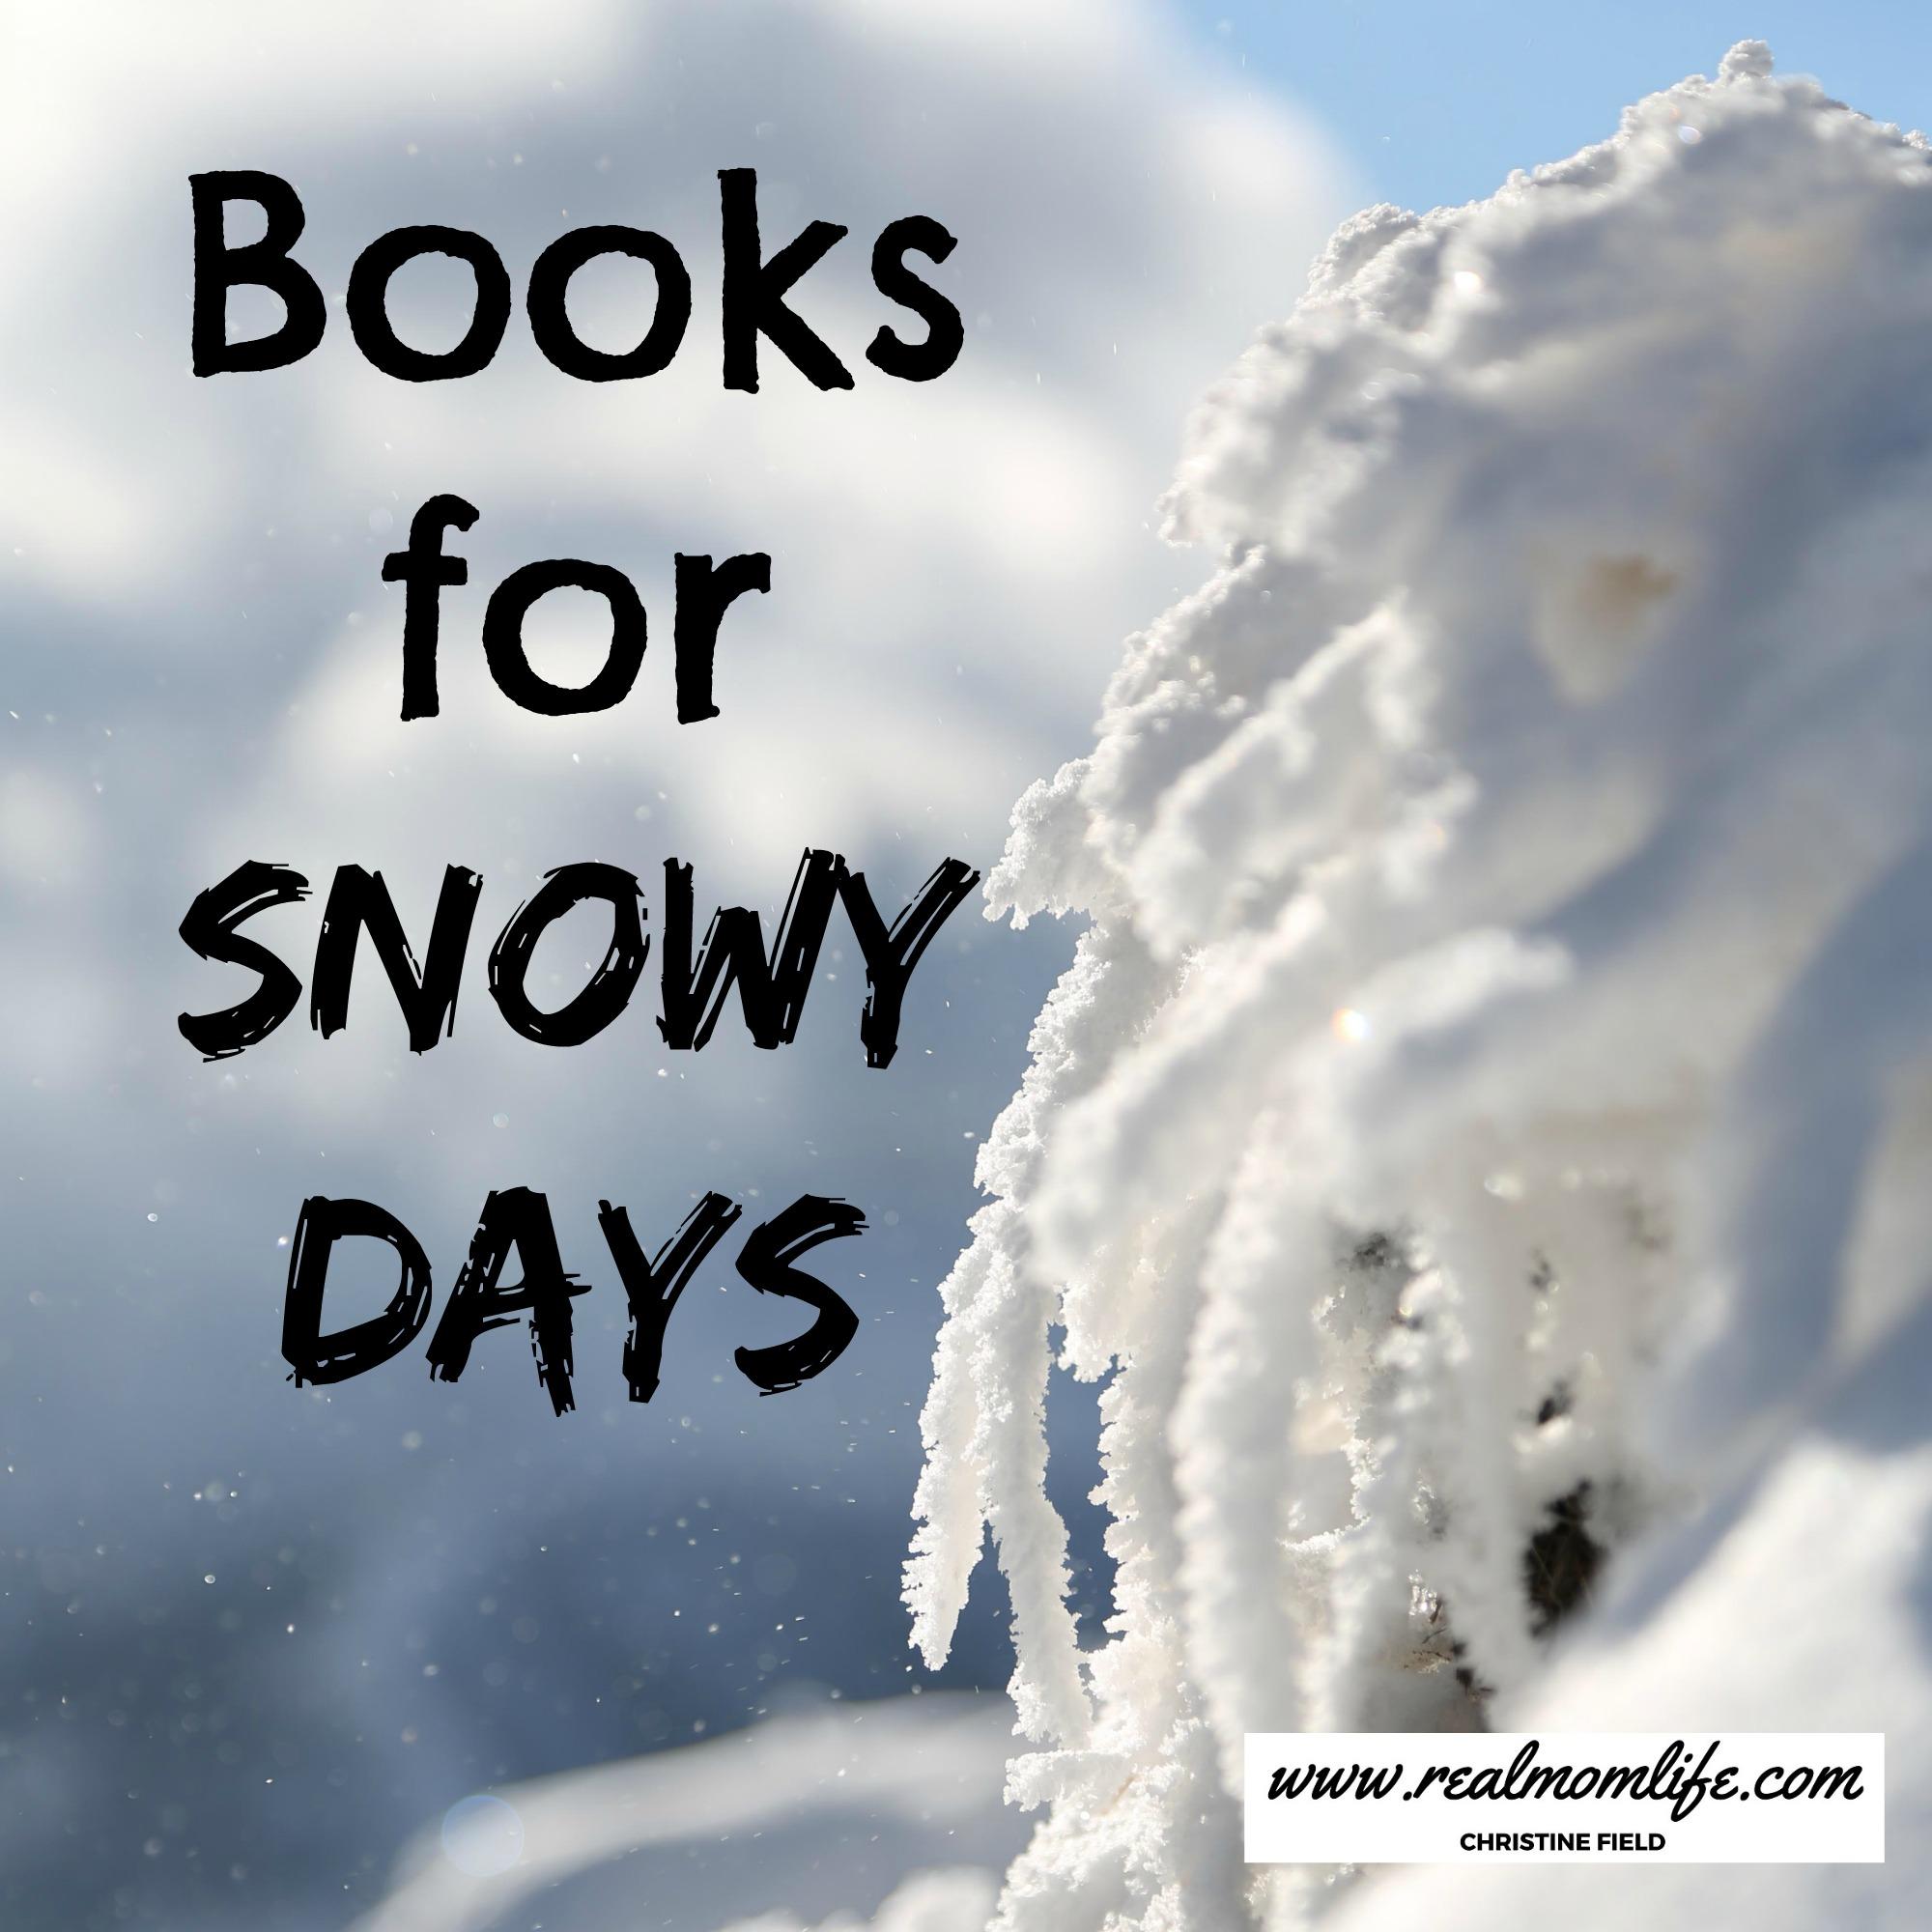 Preschool Book List: Books for snowy days